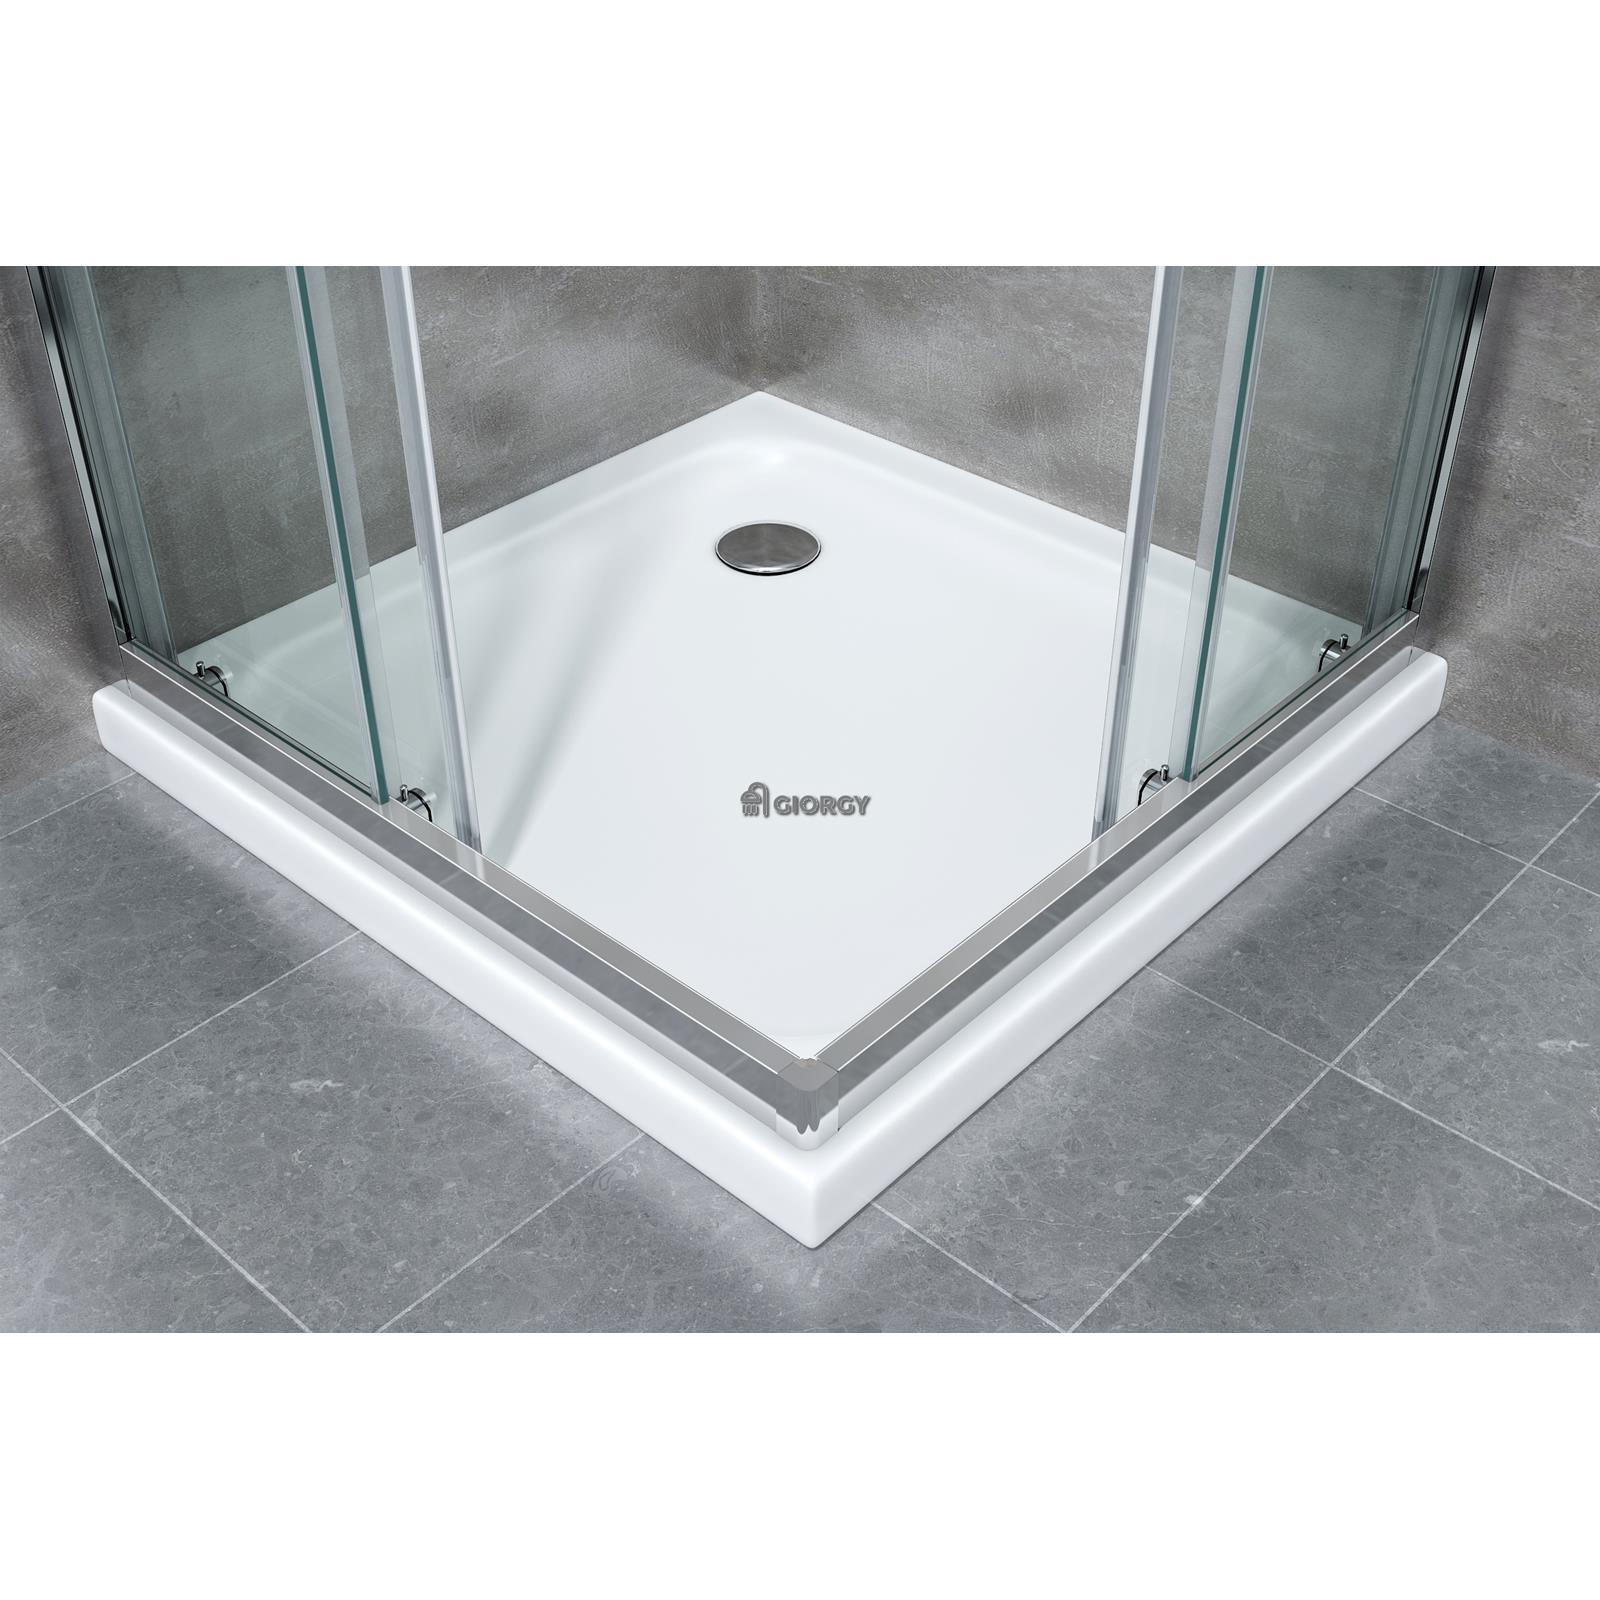 Caja cabina ducha ba o angular corredero rectangular 70 80 for Instalacion cabina ducha